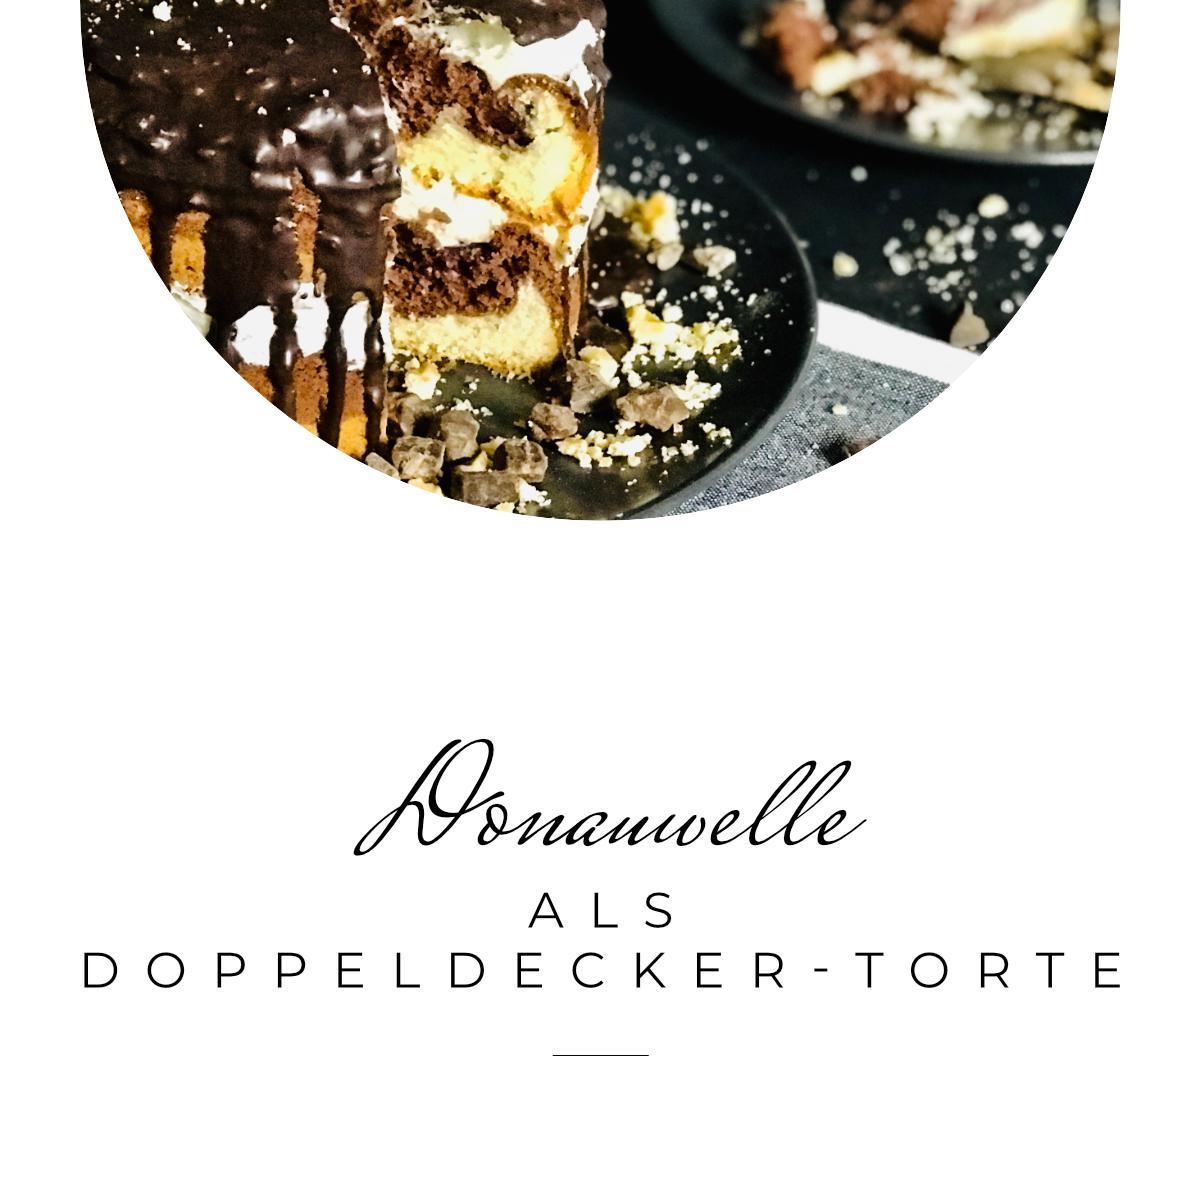 DONAUWELLE ALS DOPPELDECKER TORTE